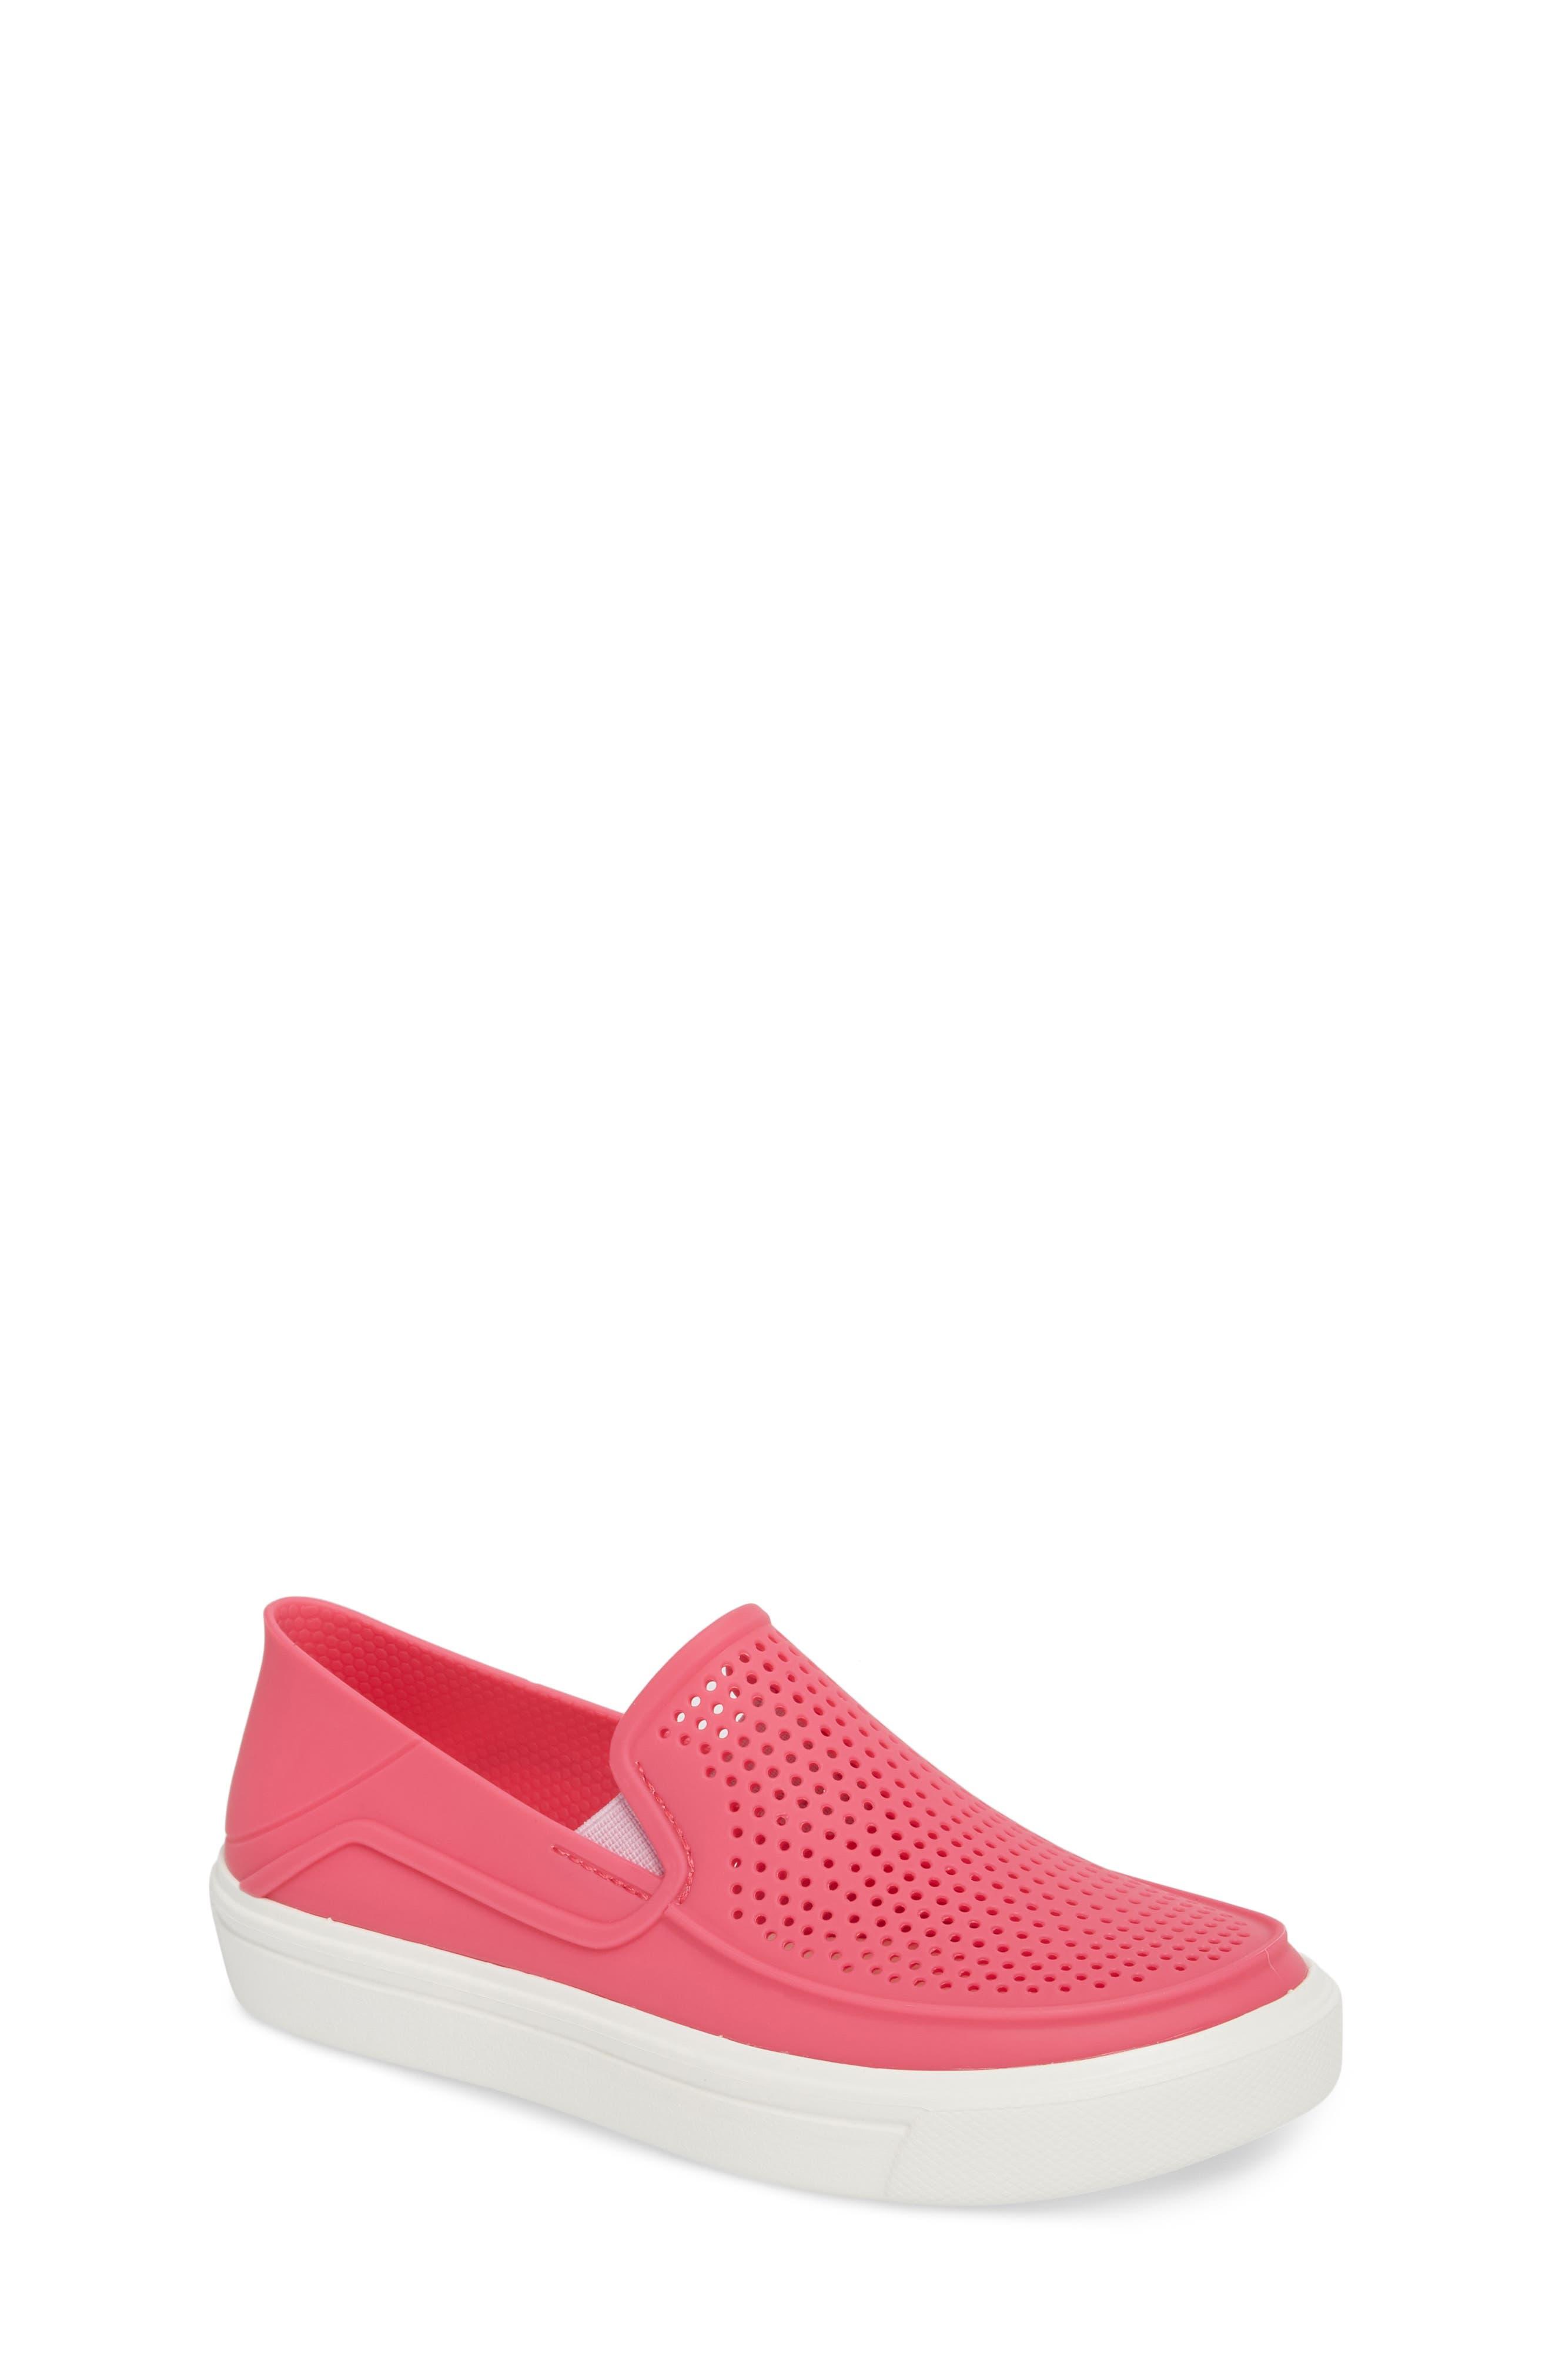 CitiLane Roka Slip-On,                         Main,                         color, Paradise Pink/ White